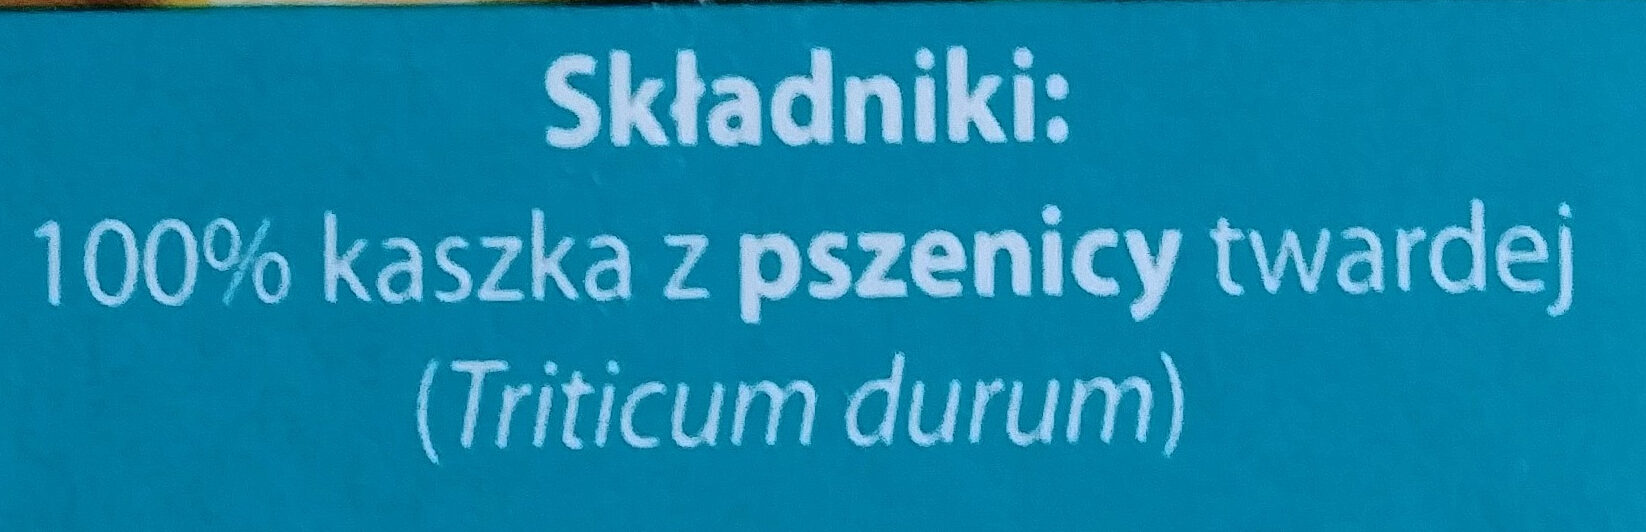 Lestello couscous - Składniki - pl